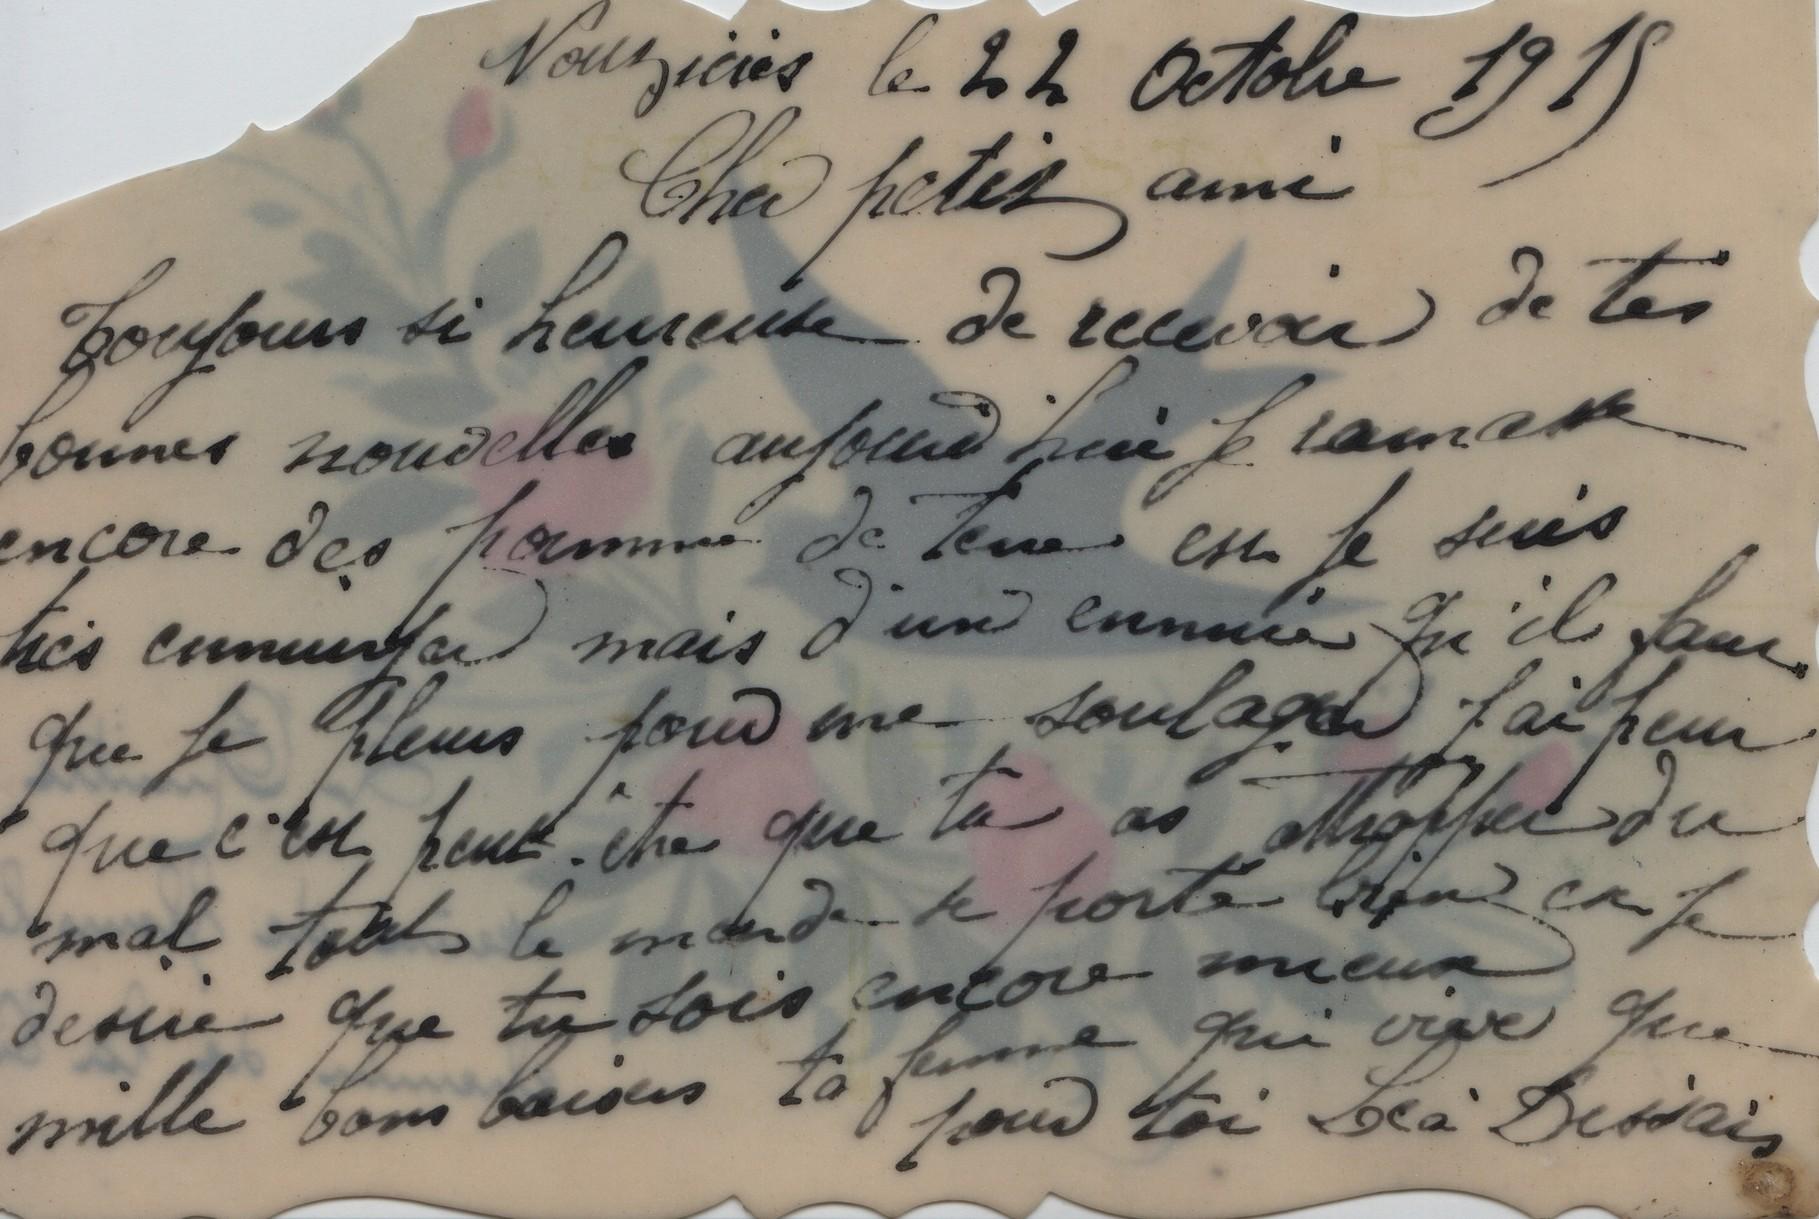 4. Nouzières 22 October 1918